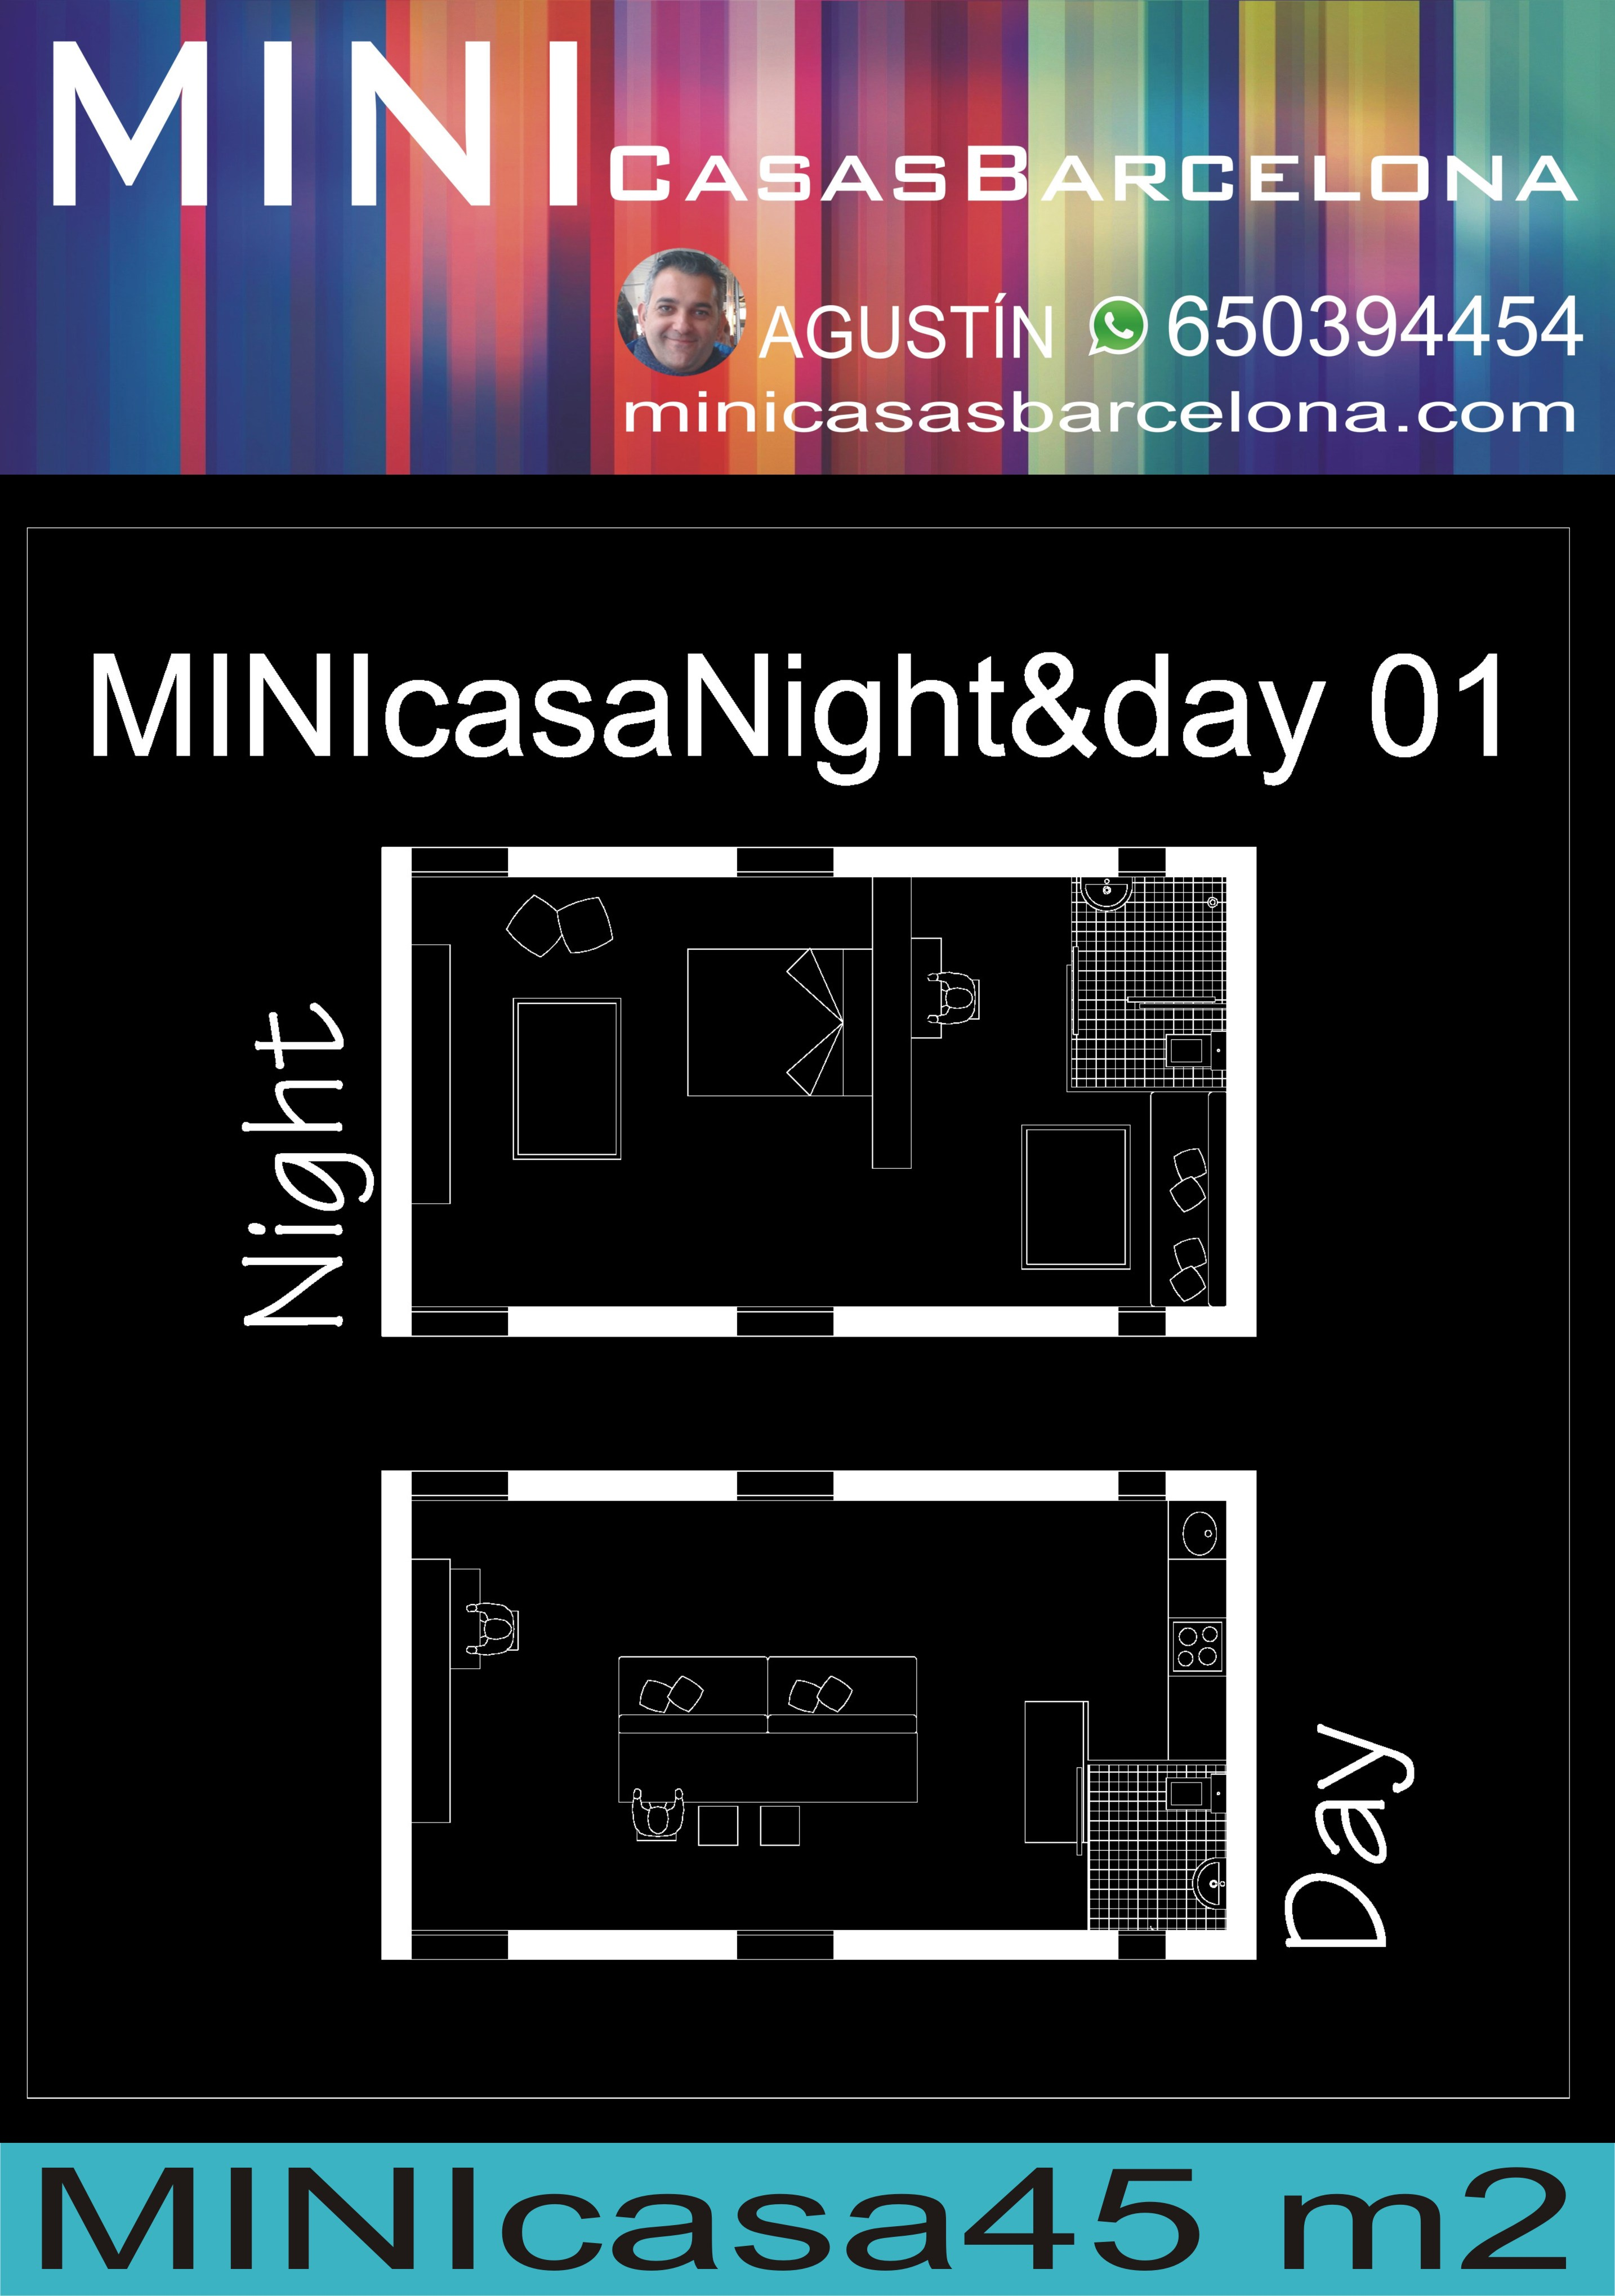 MINIcasaBarcelona.com Agustín Góngora Night&Day